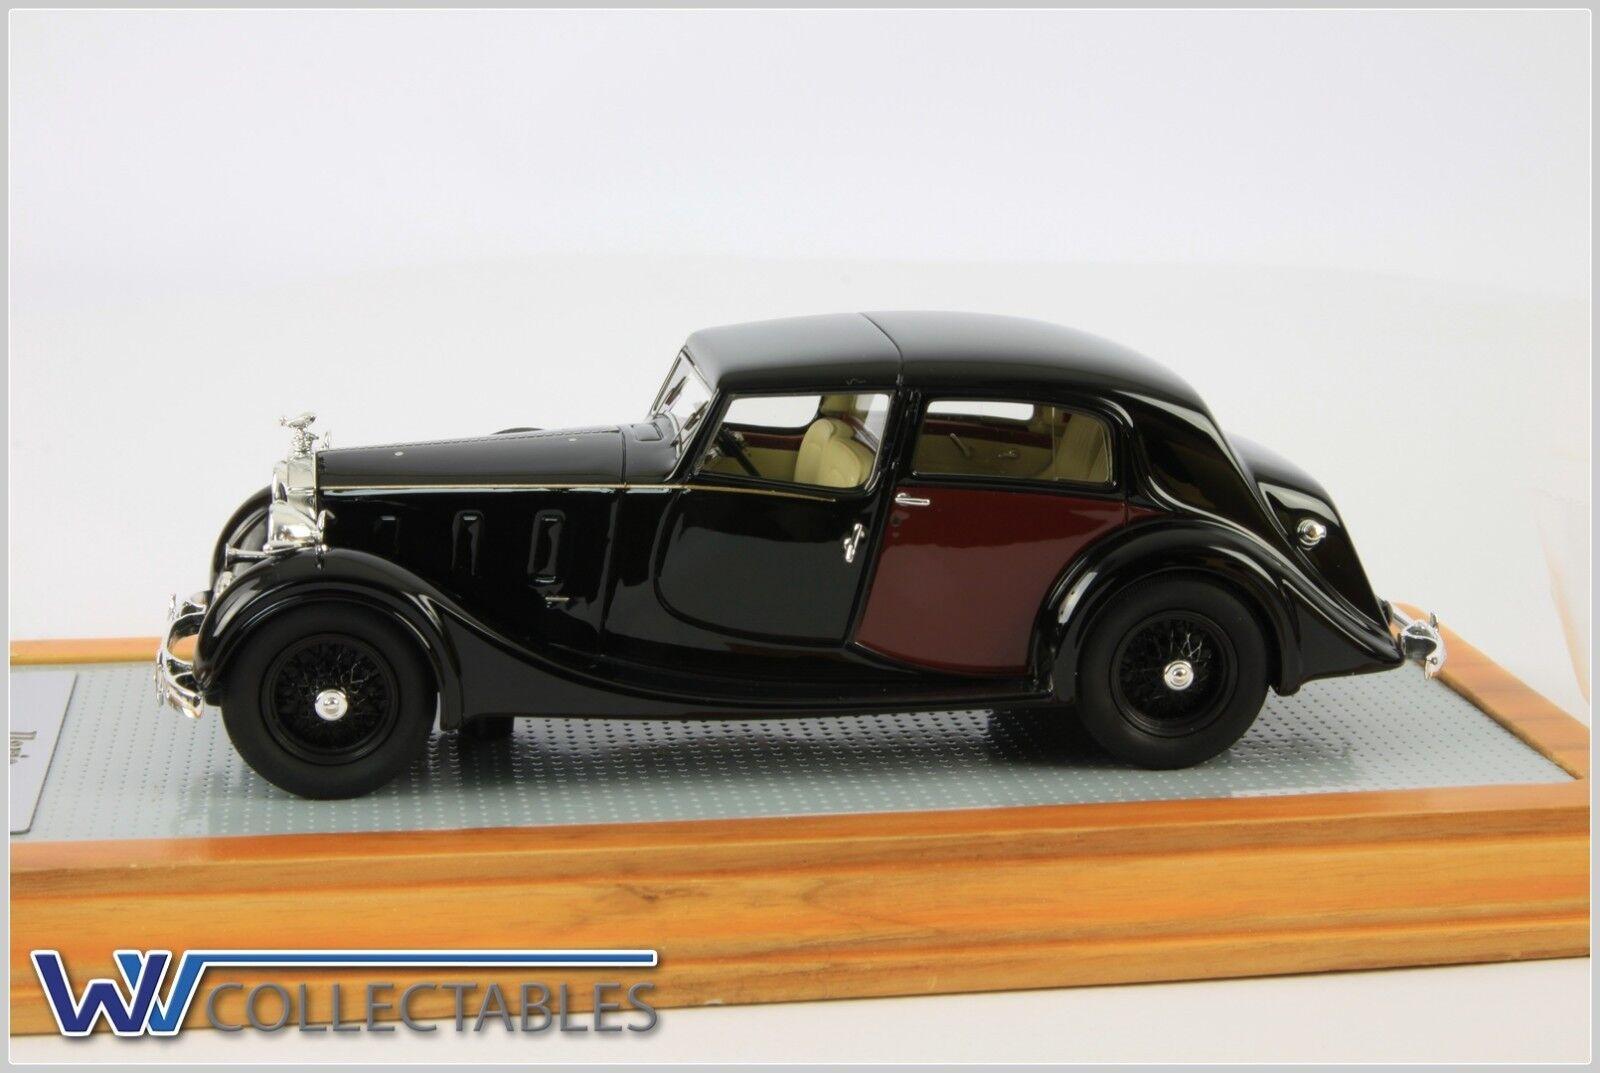 Ilario Rolls R plll il 43088 SEDANCE DE VILLE 1937 Limited 130 pieces 1 43